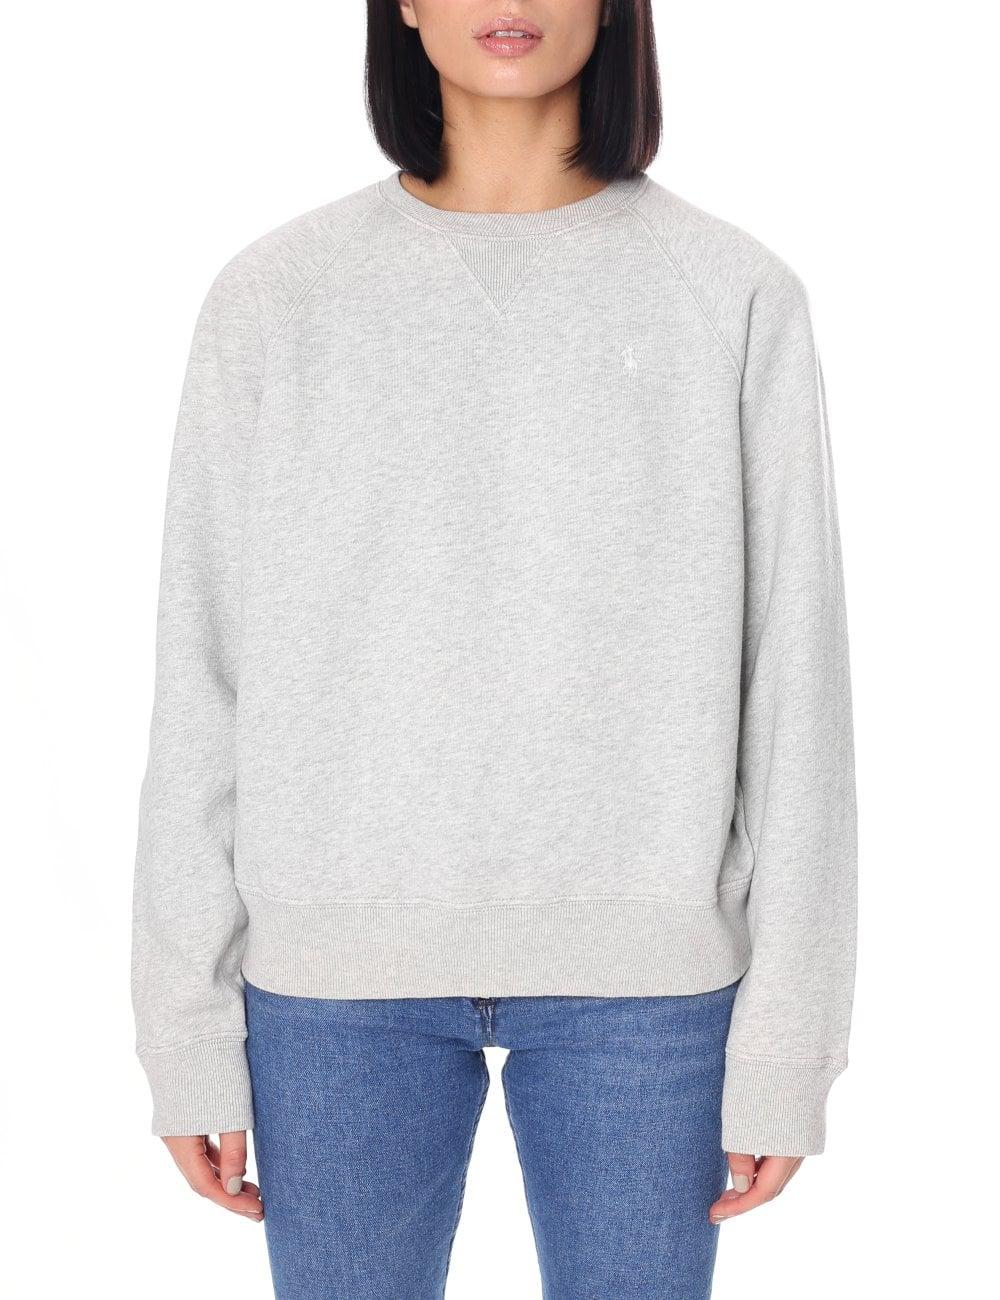 Crew Women's Ralph Lauren Sweatshirt Polo Neck kiPXZu